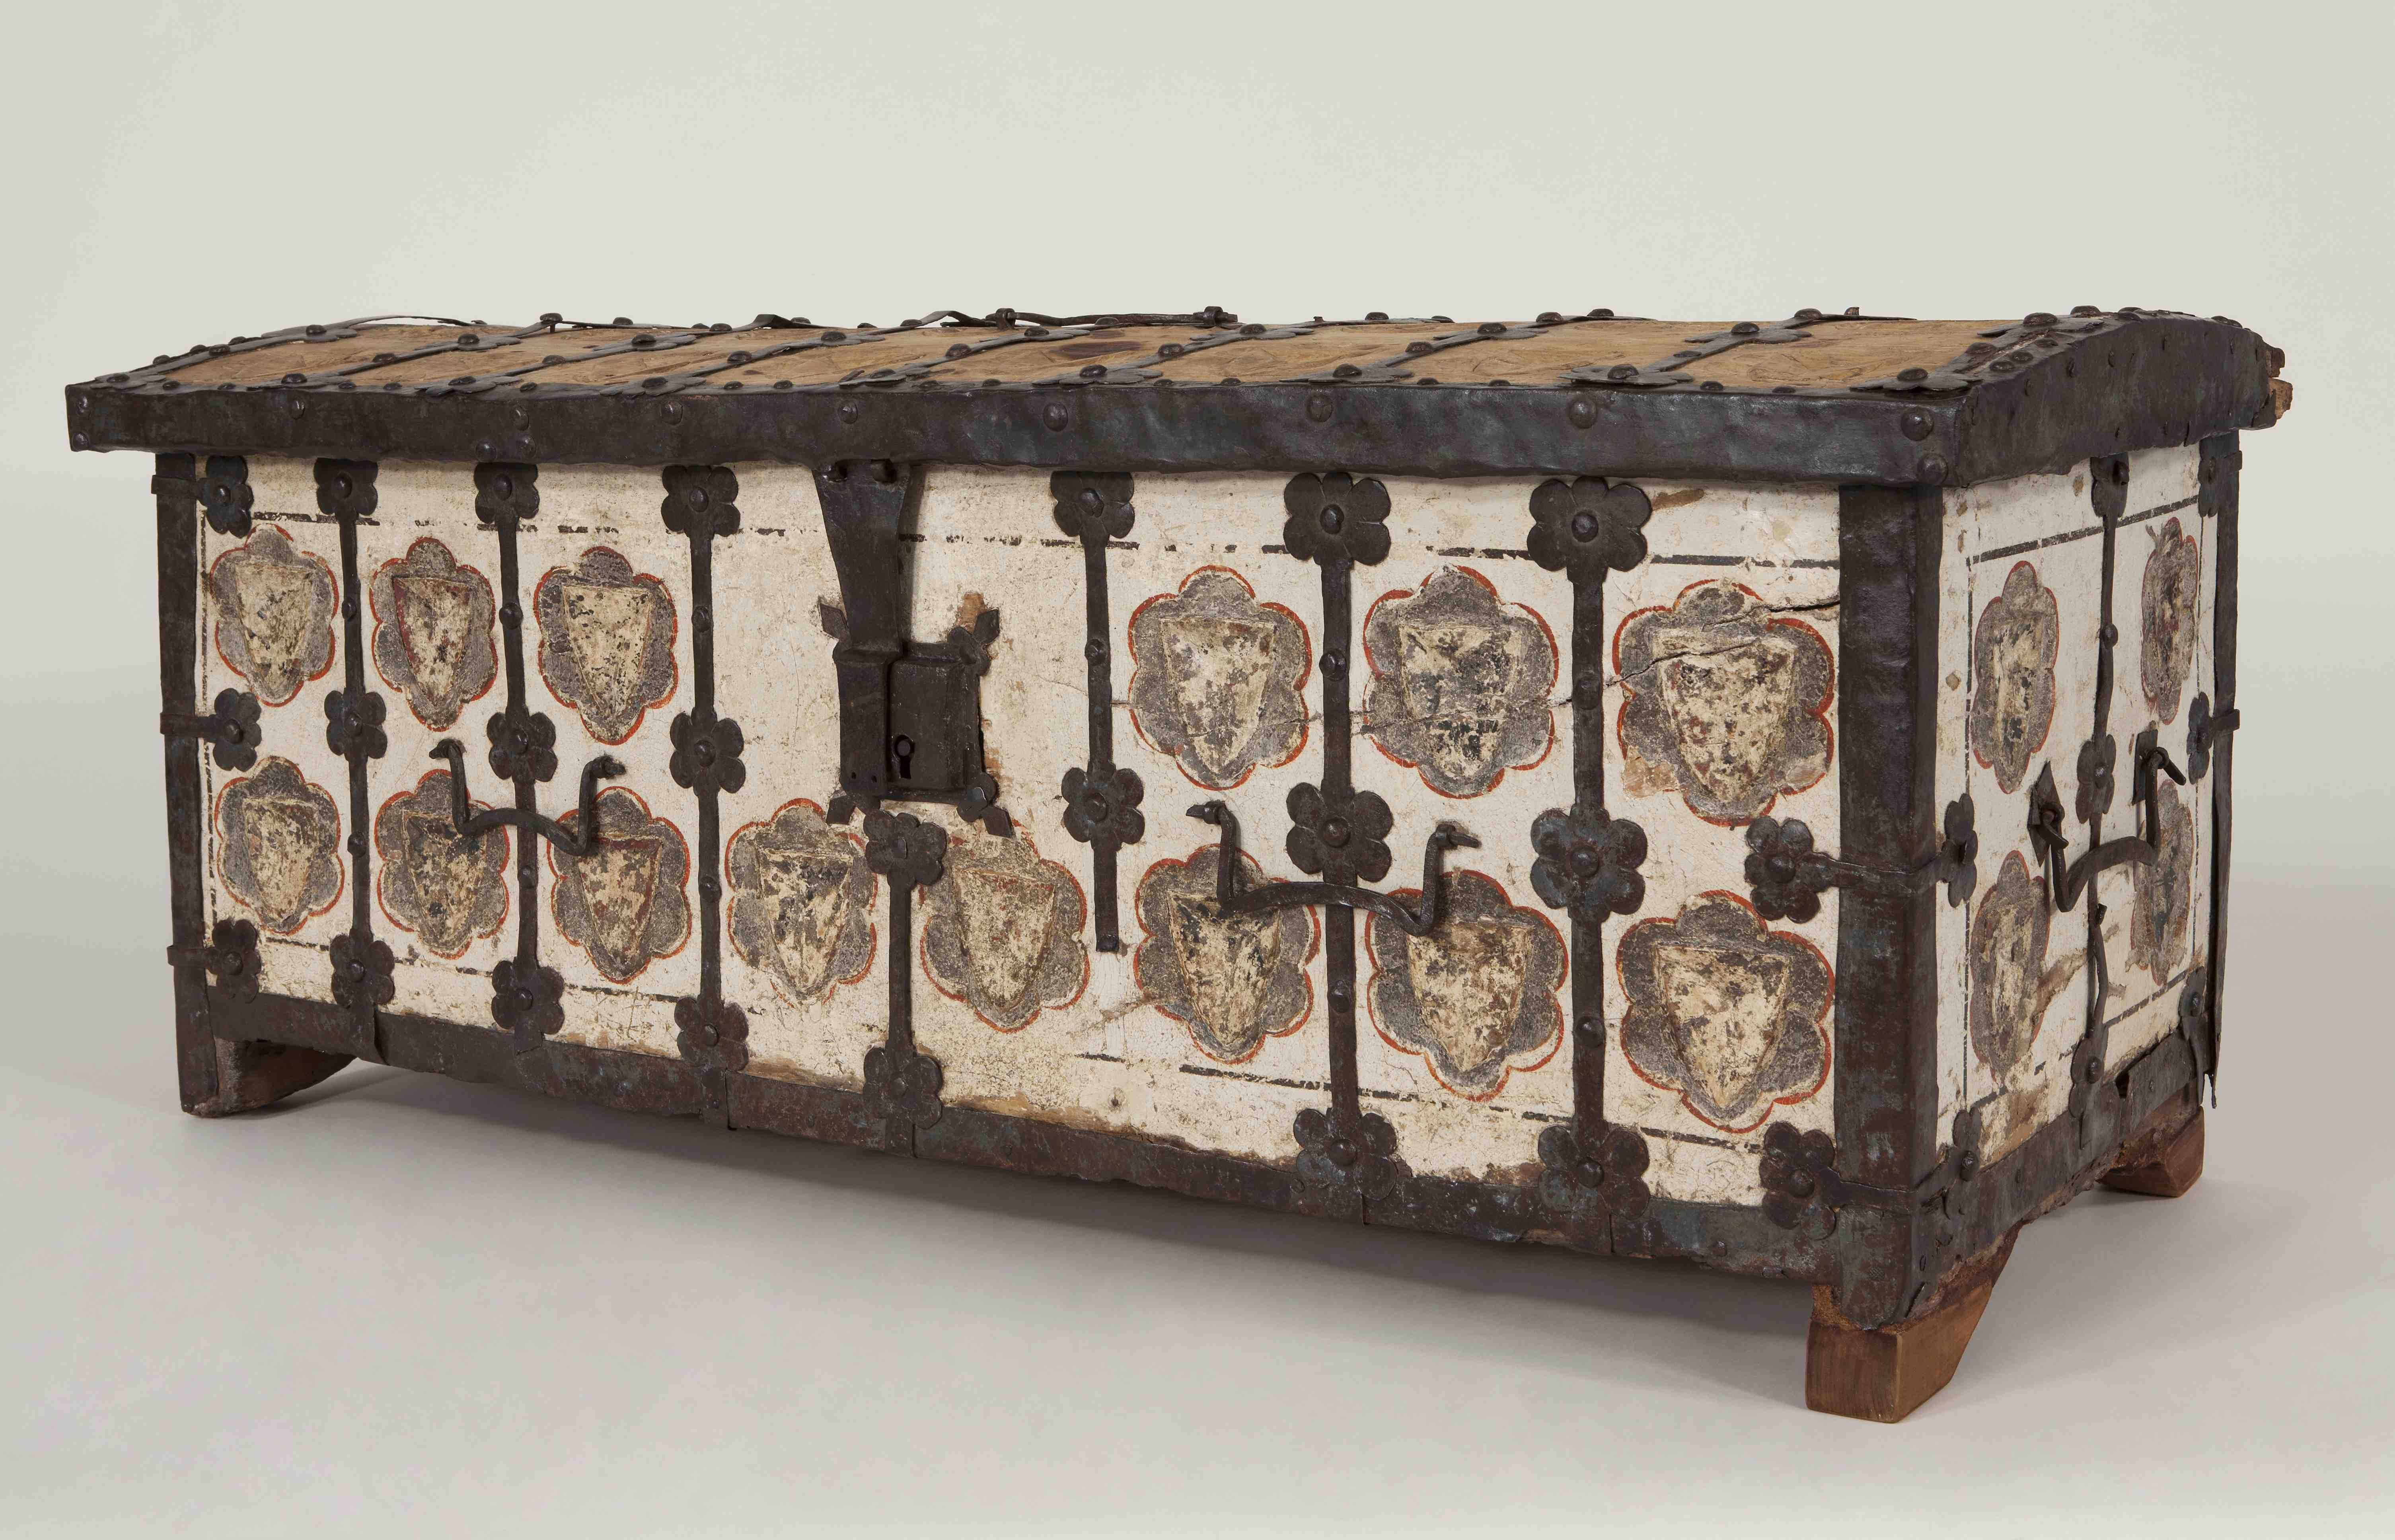 Cofre. Barcelona (?), segle XIV. Donació Junta de Museus, 1932